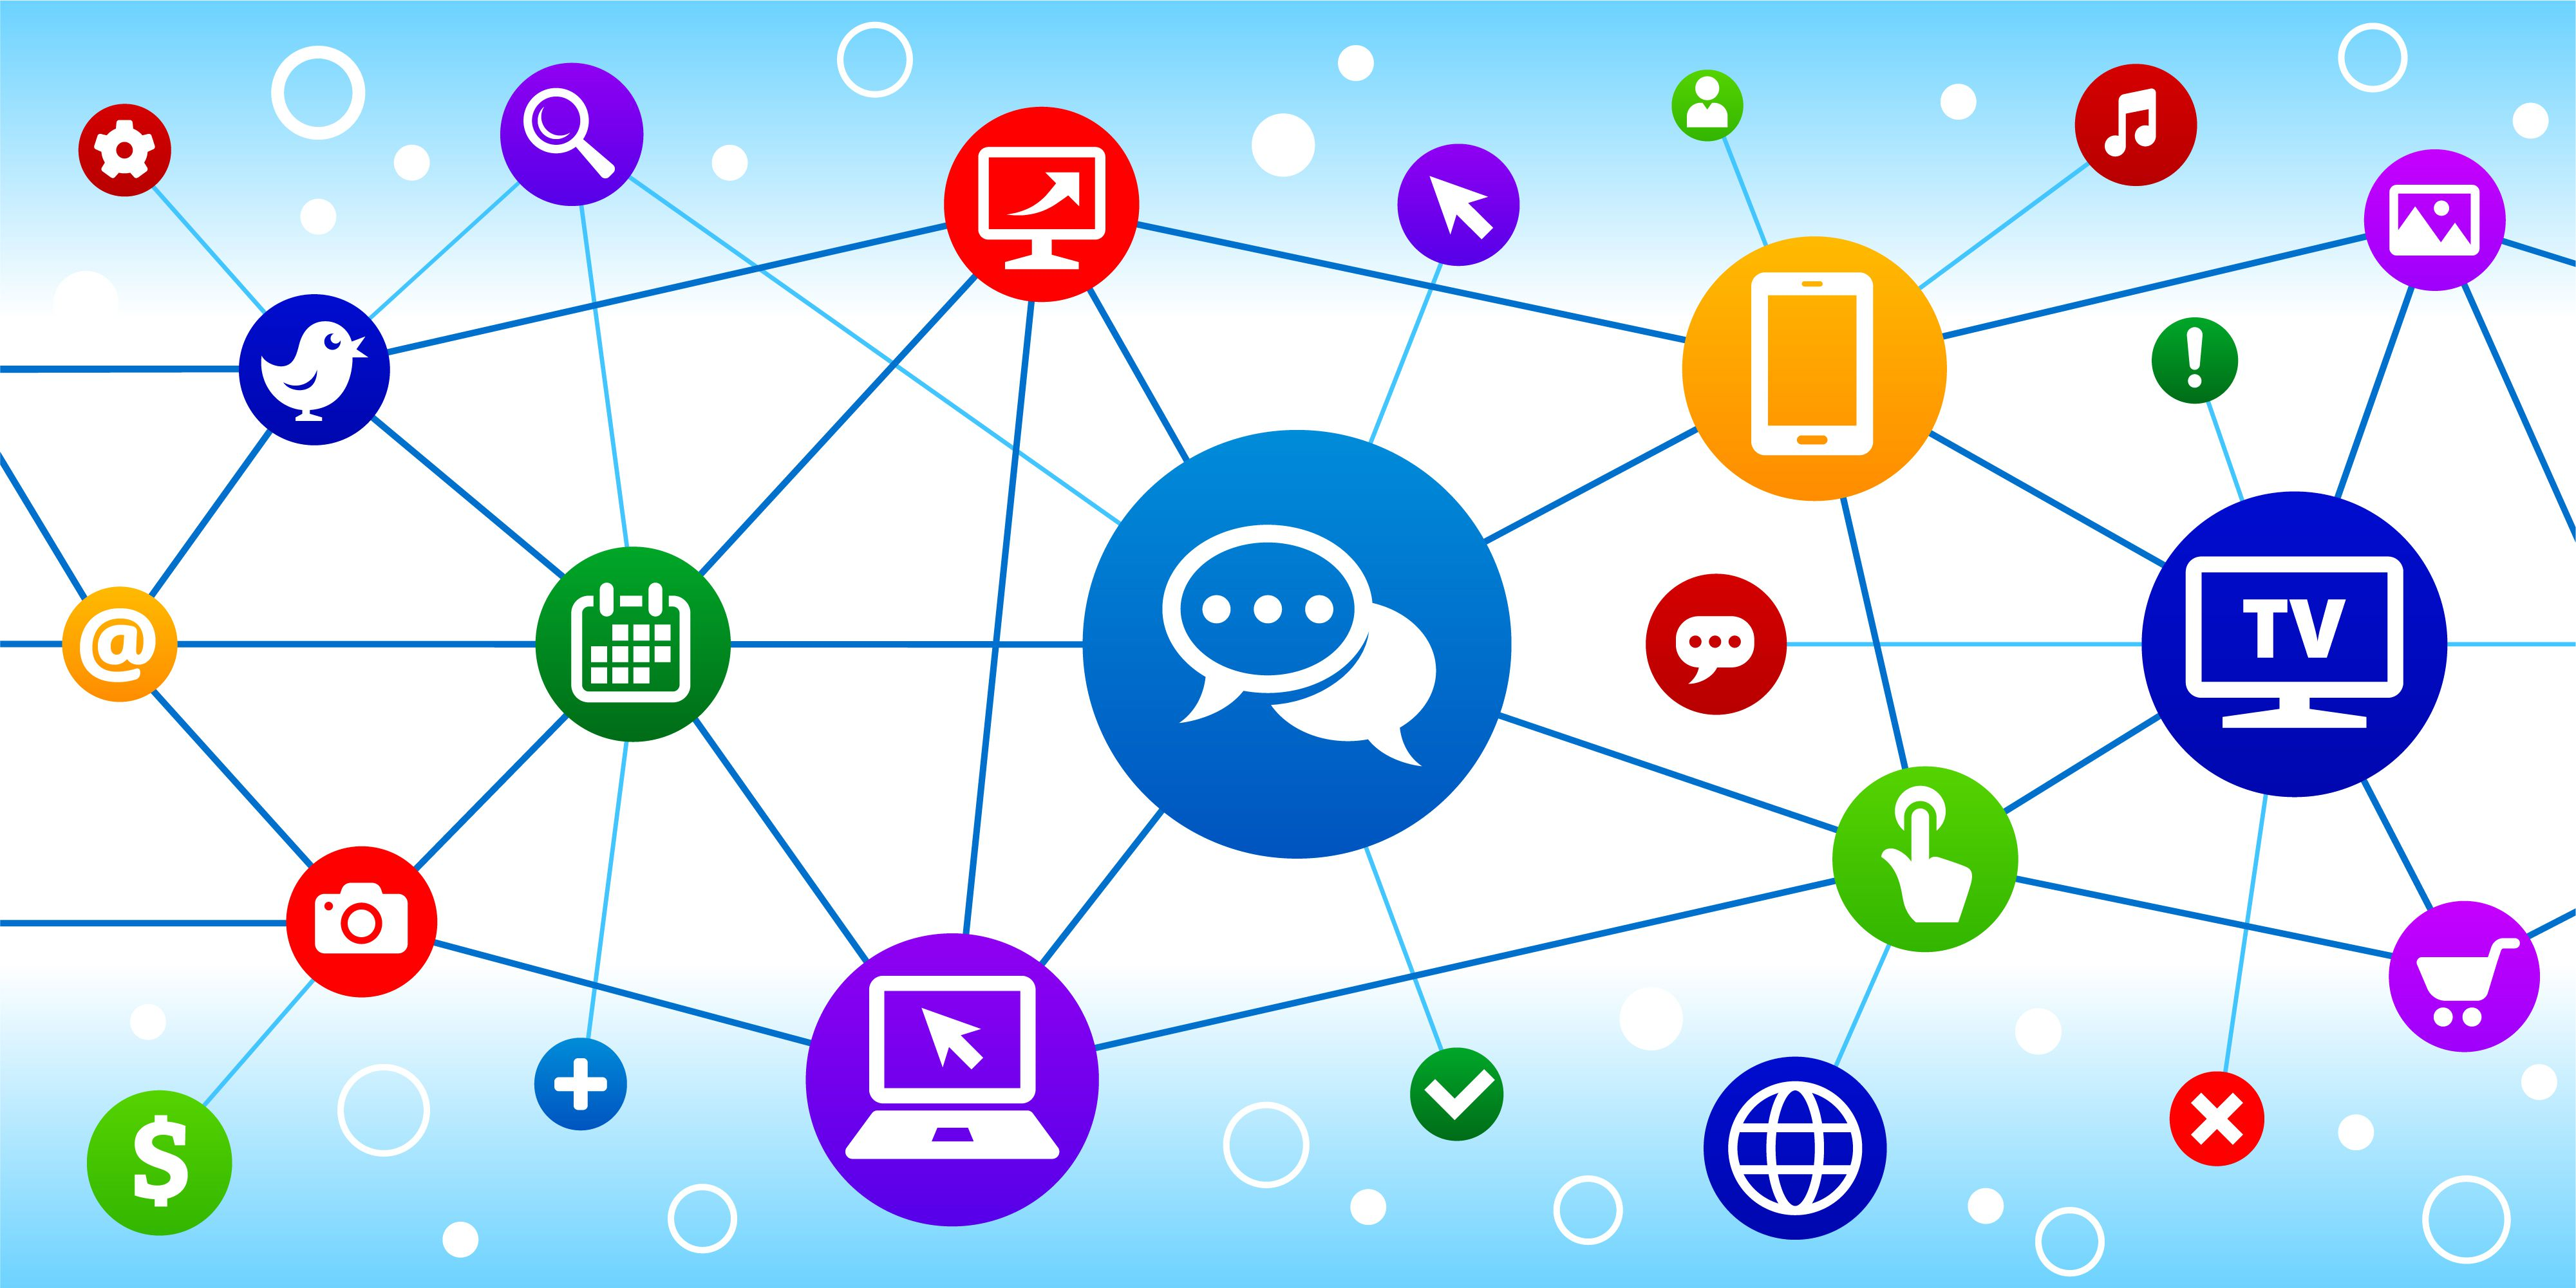 understanding mass media and mass communication